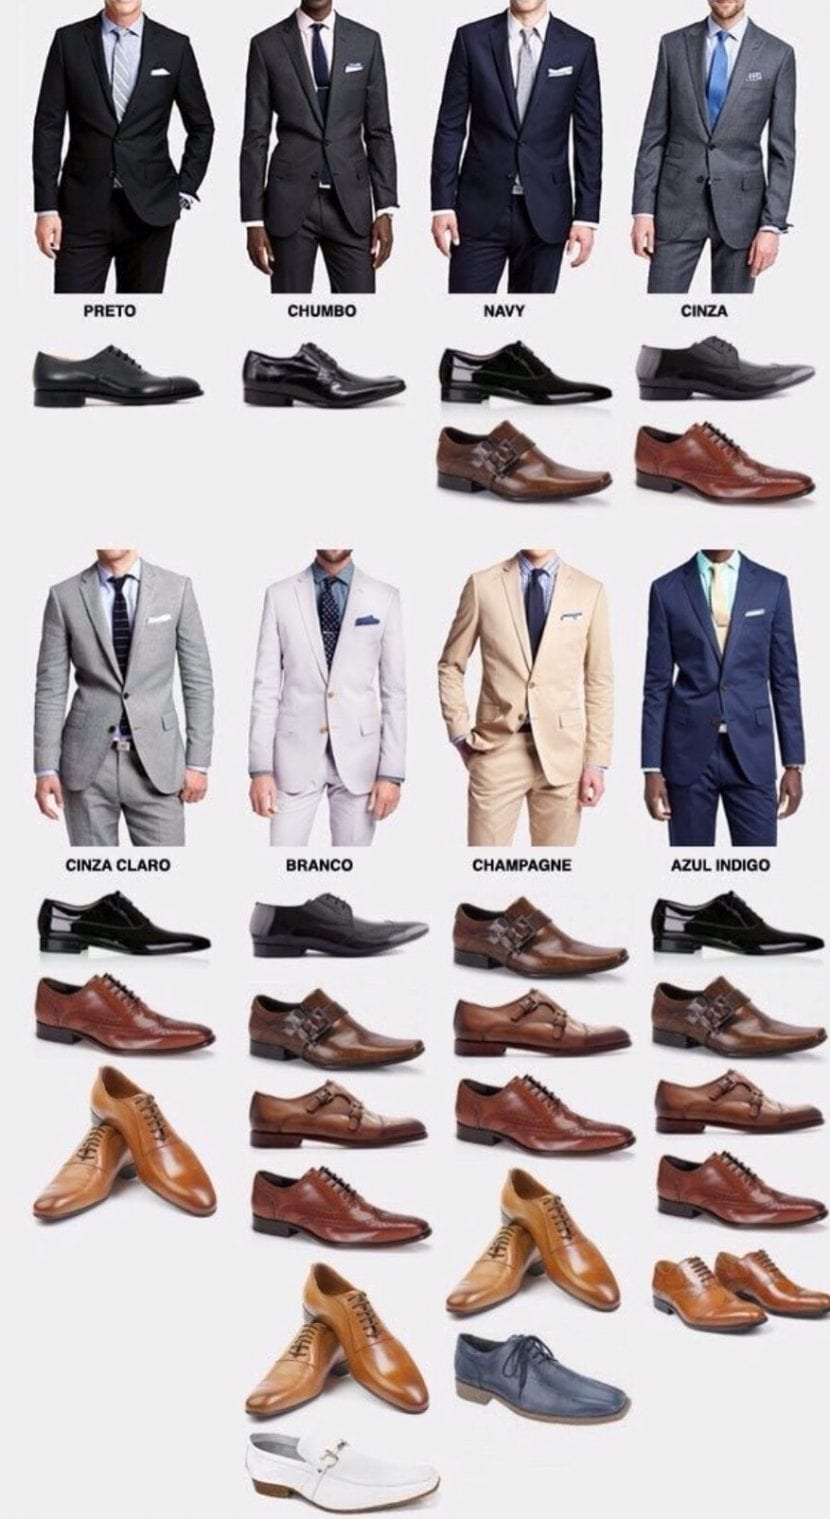 combinar-trajes-con-zapato